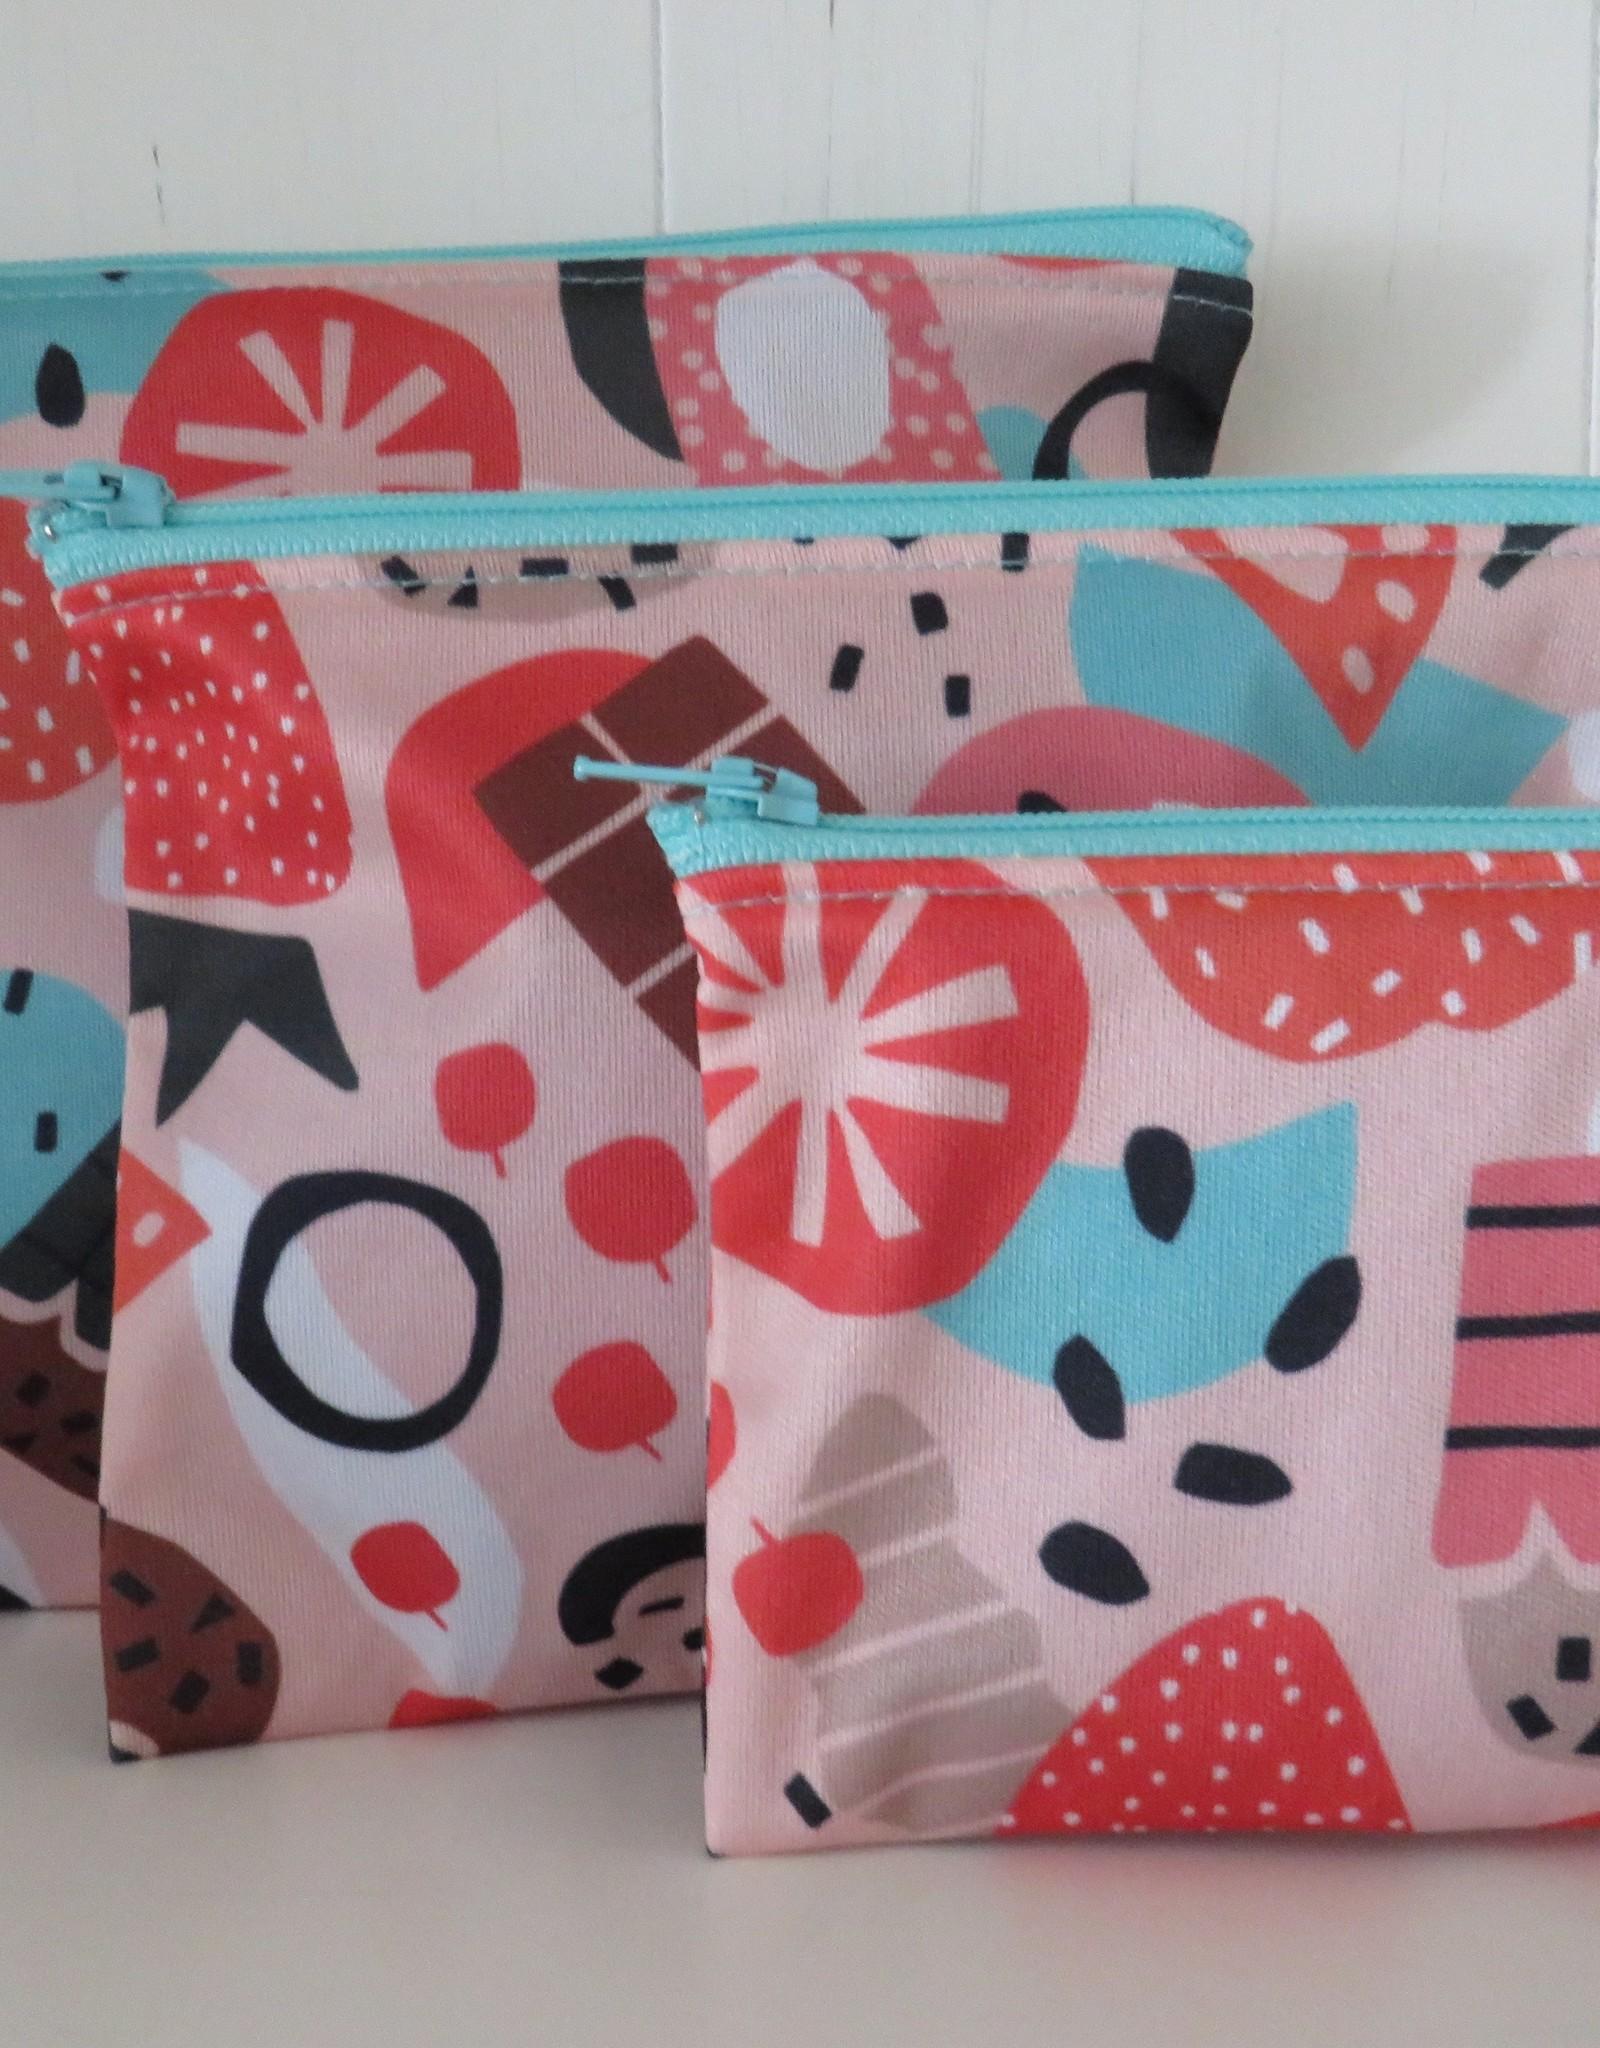 Hubert Cormier - Large Reusable Snack Bag Pink